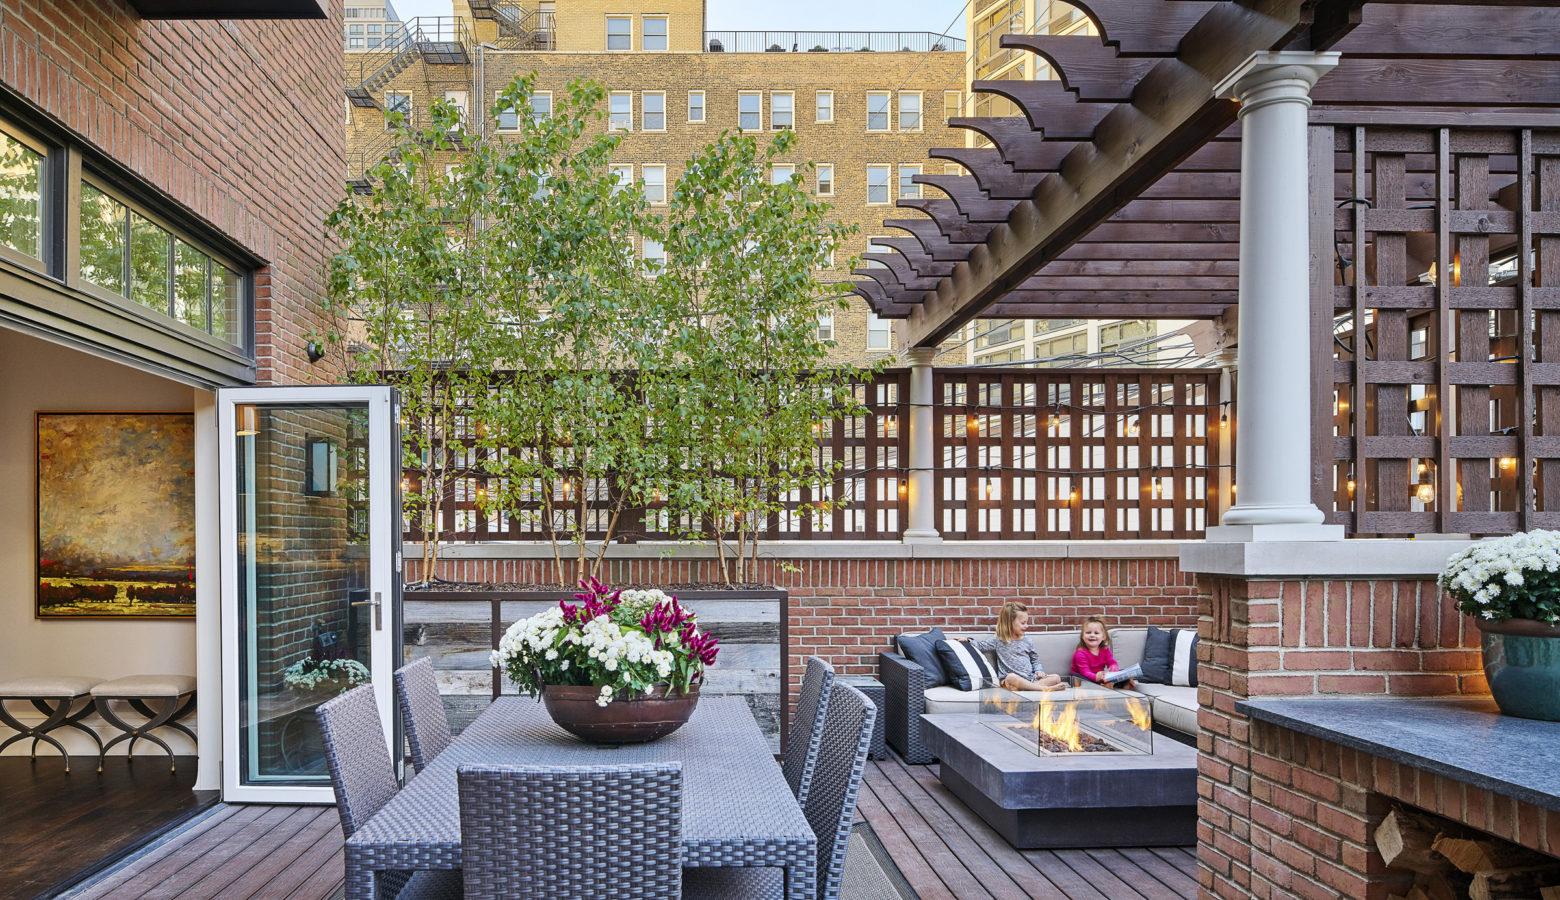 Inspirational Ideas for Outdoor Living